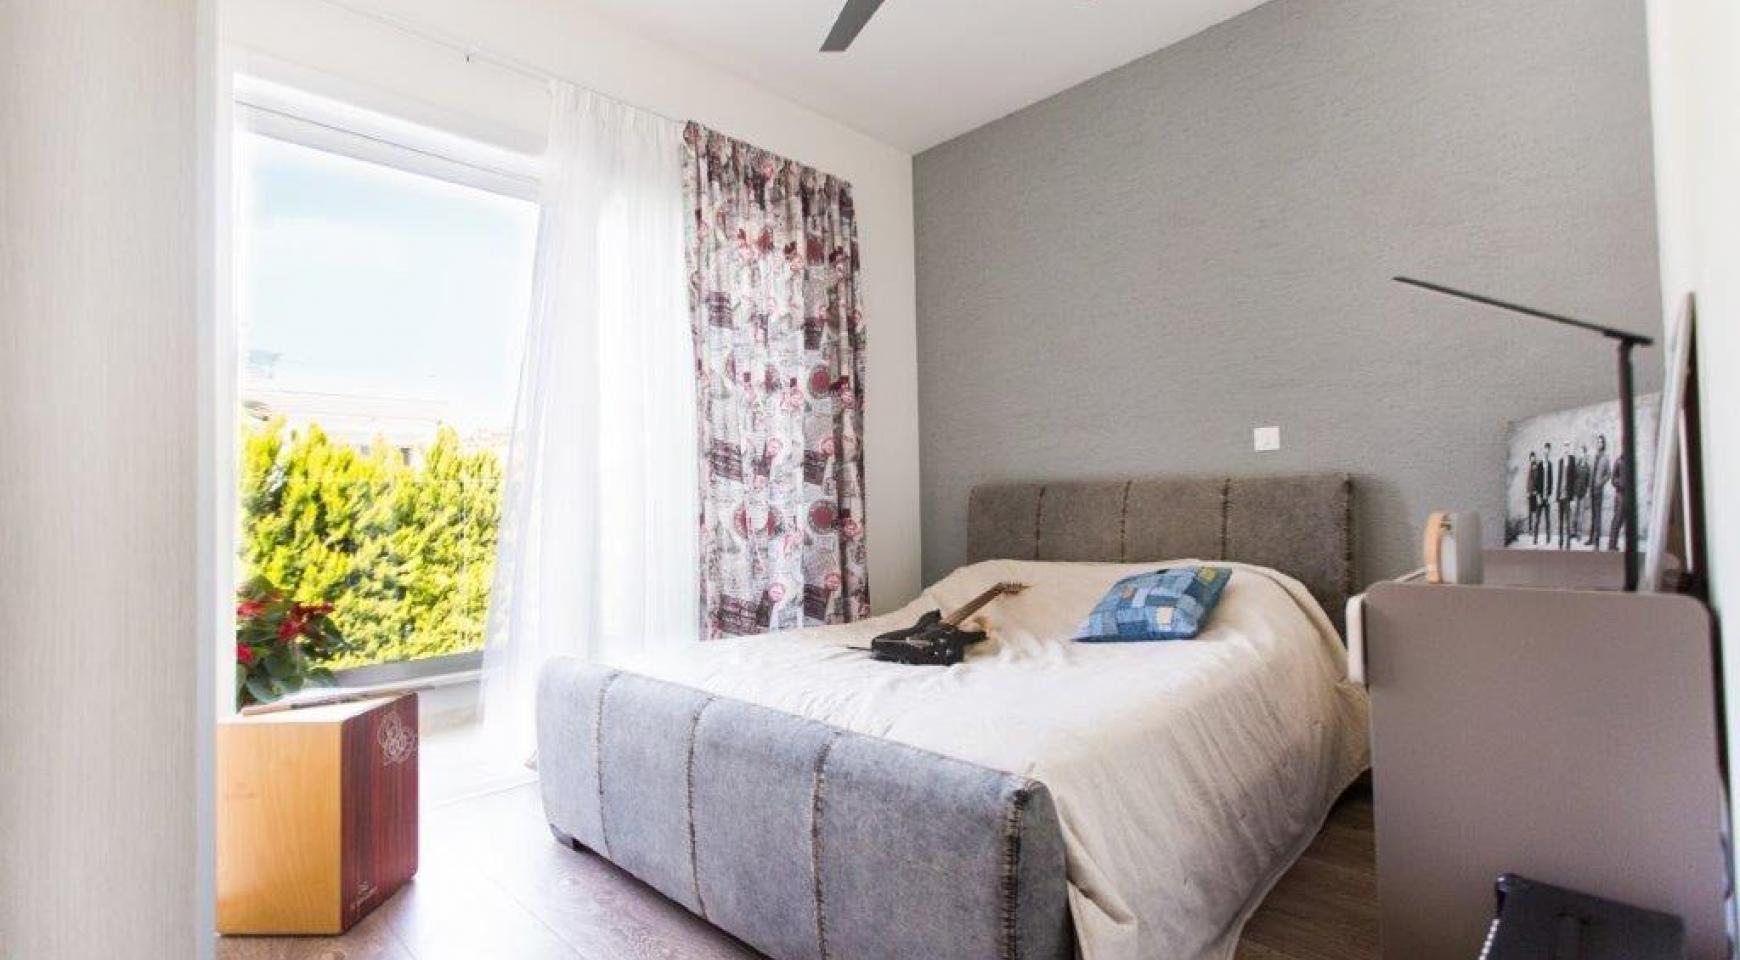 3 Bedroom Villa in Ipsonas Area - 8